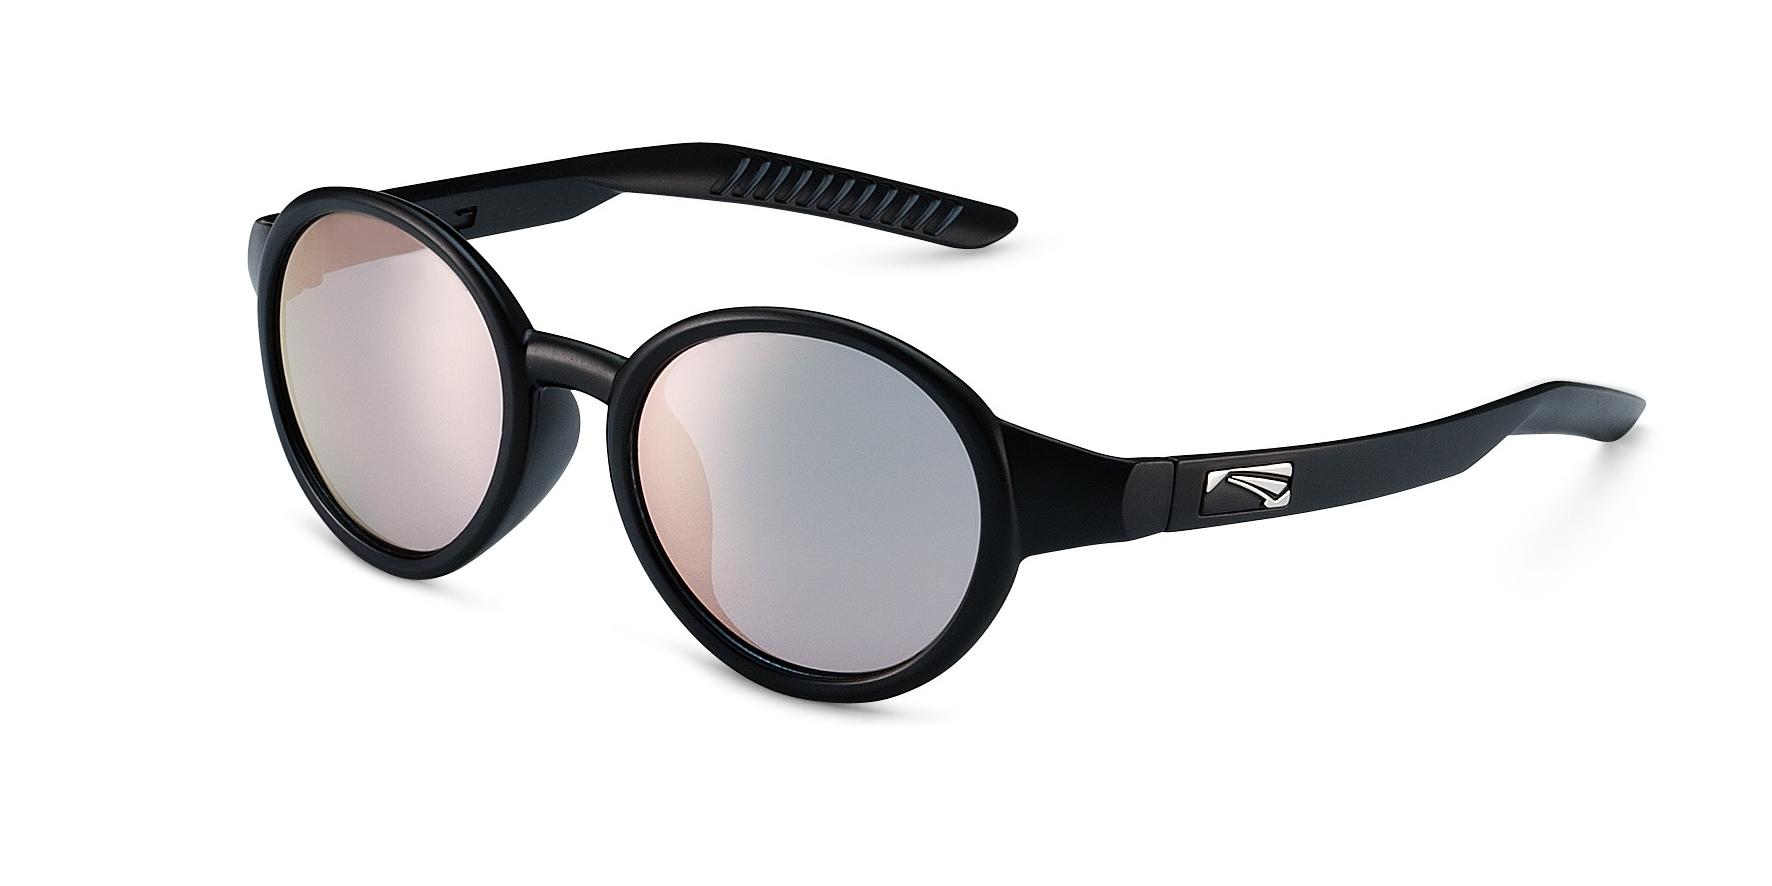 b9ea80ad66 VELO - LiP Watersports Sunglasses